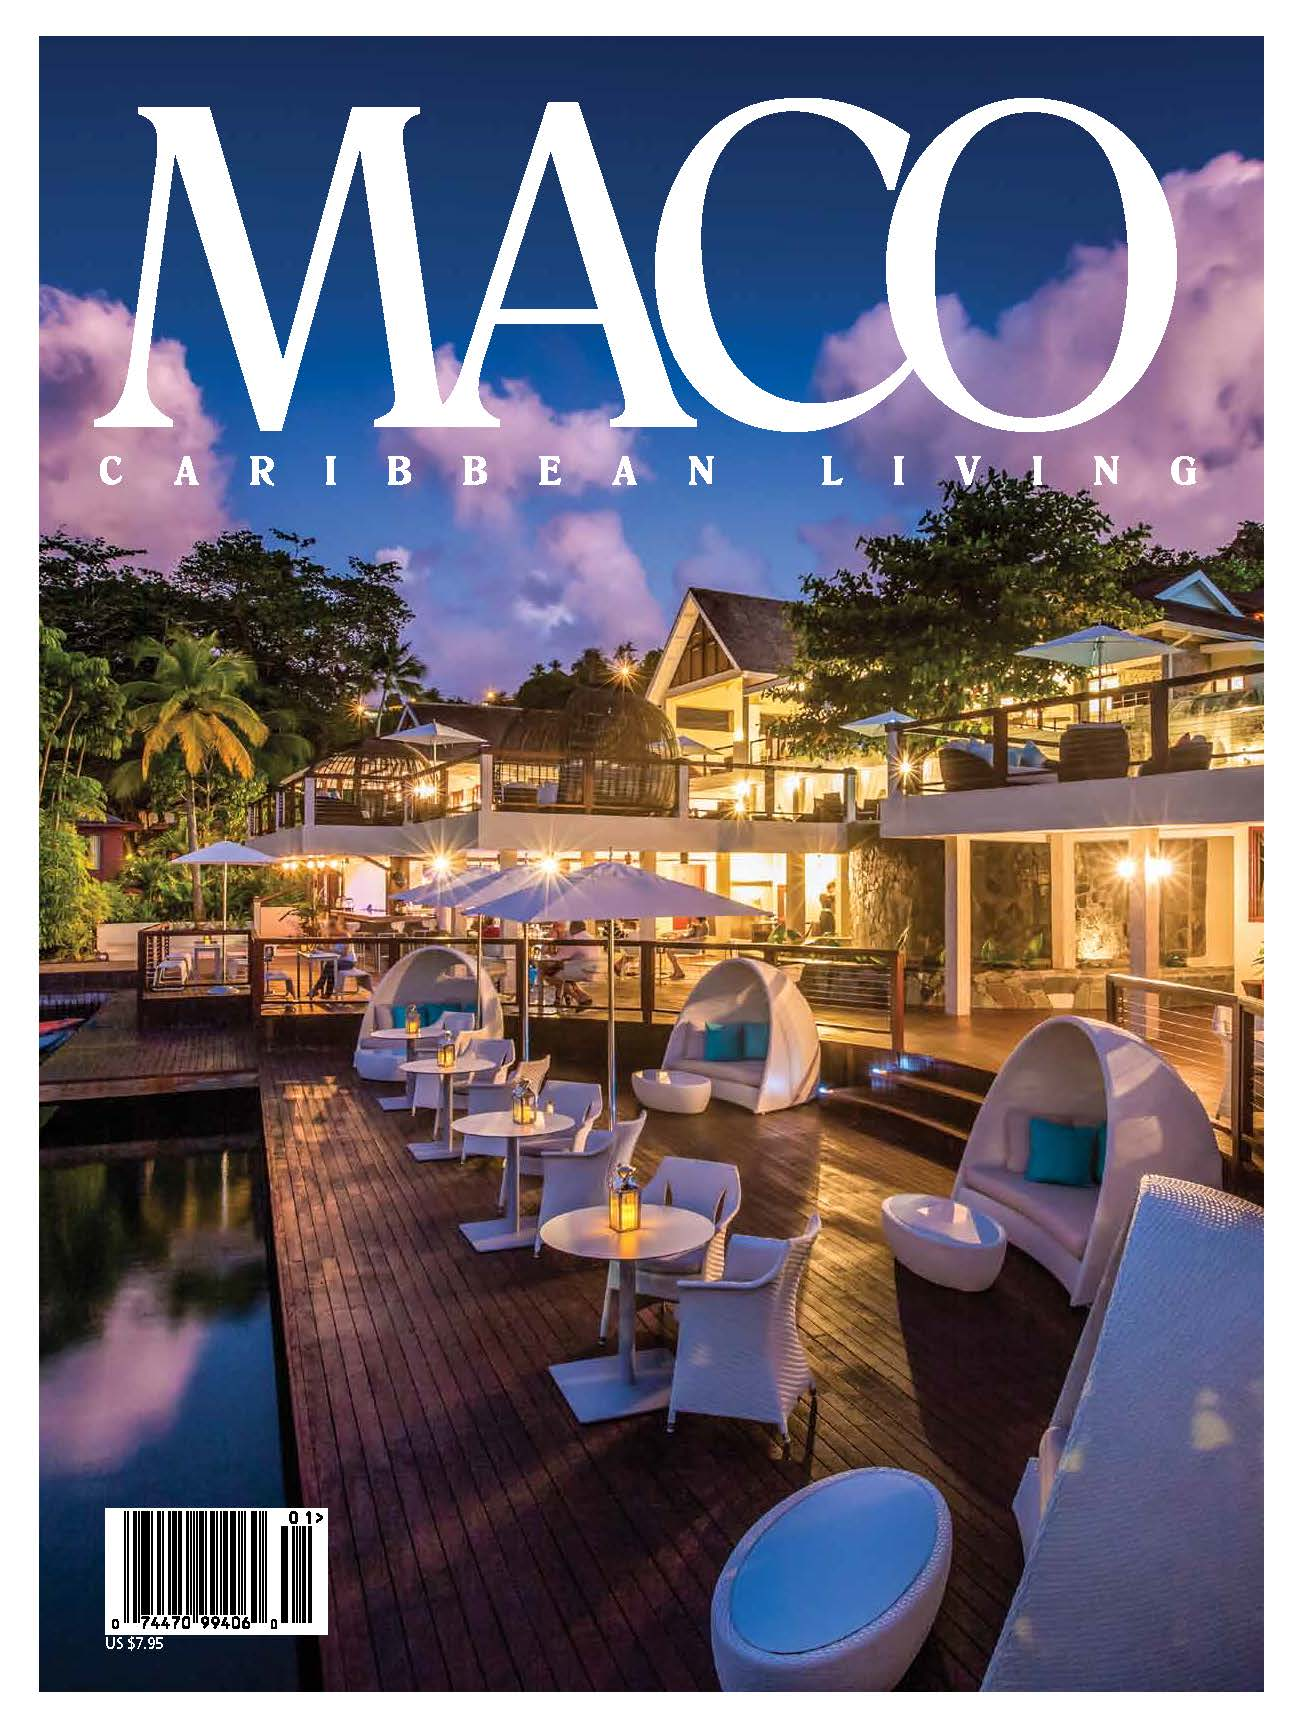 maco-caribbean-living-volume-18-issue-1_Page_001.jpg